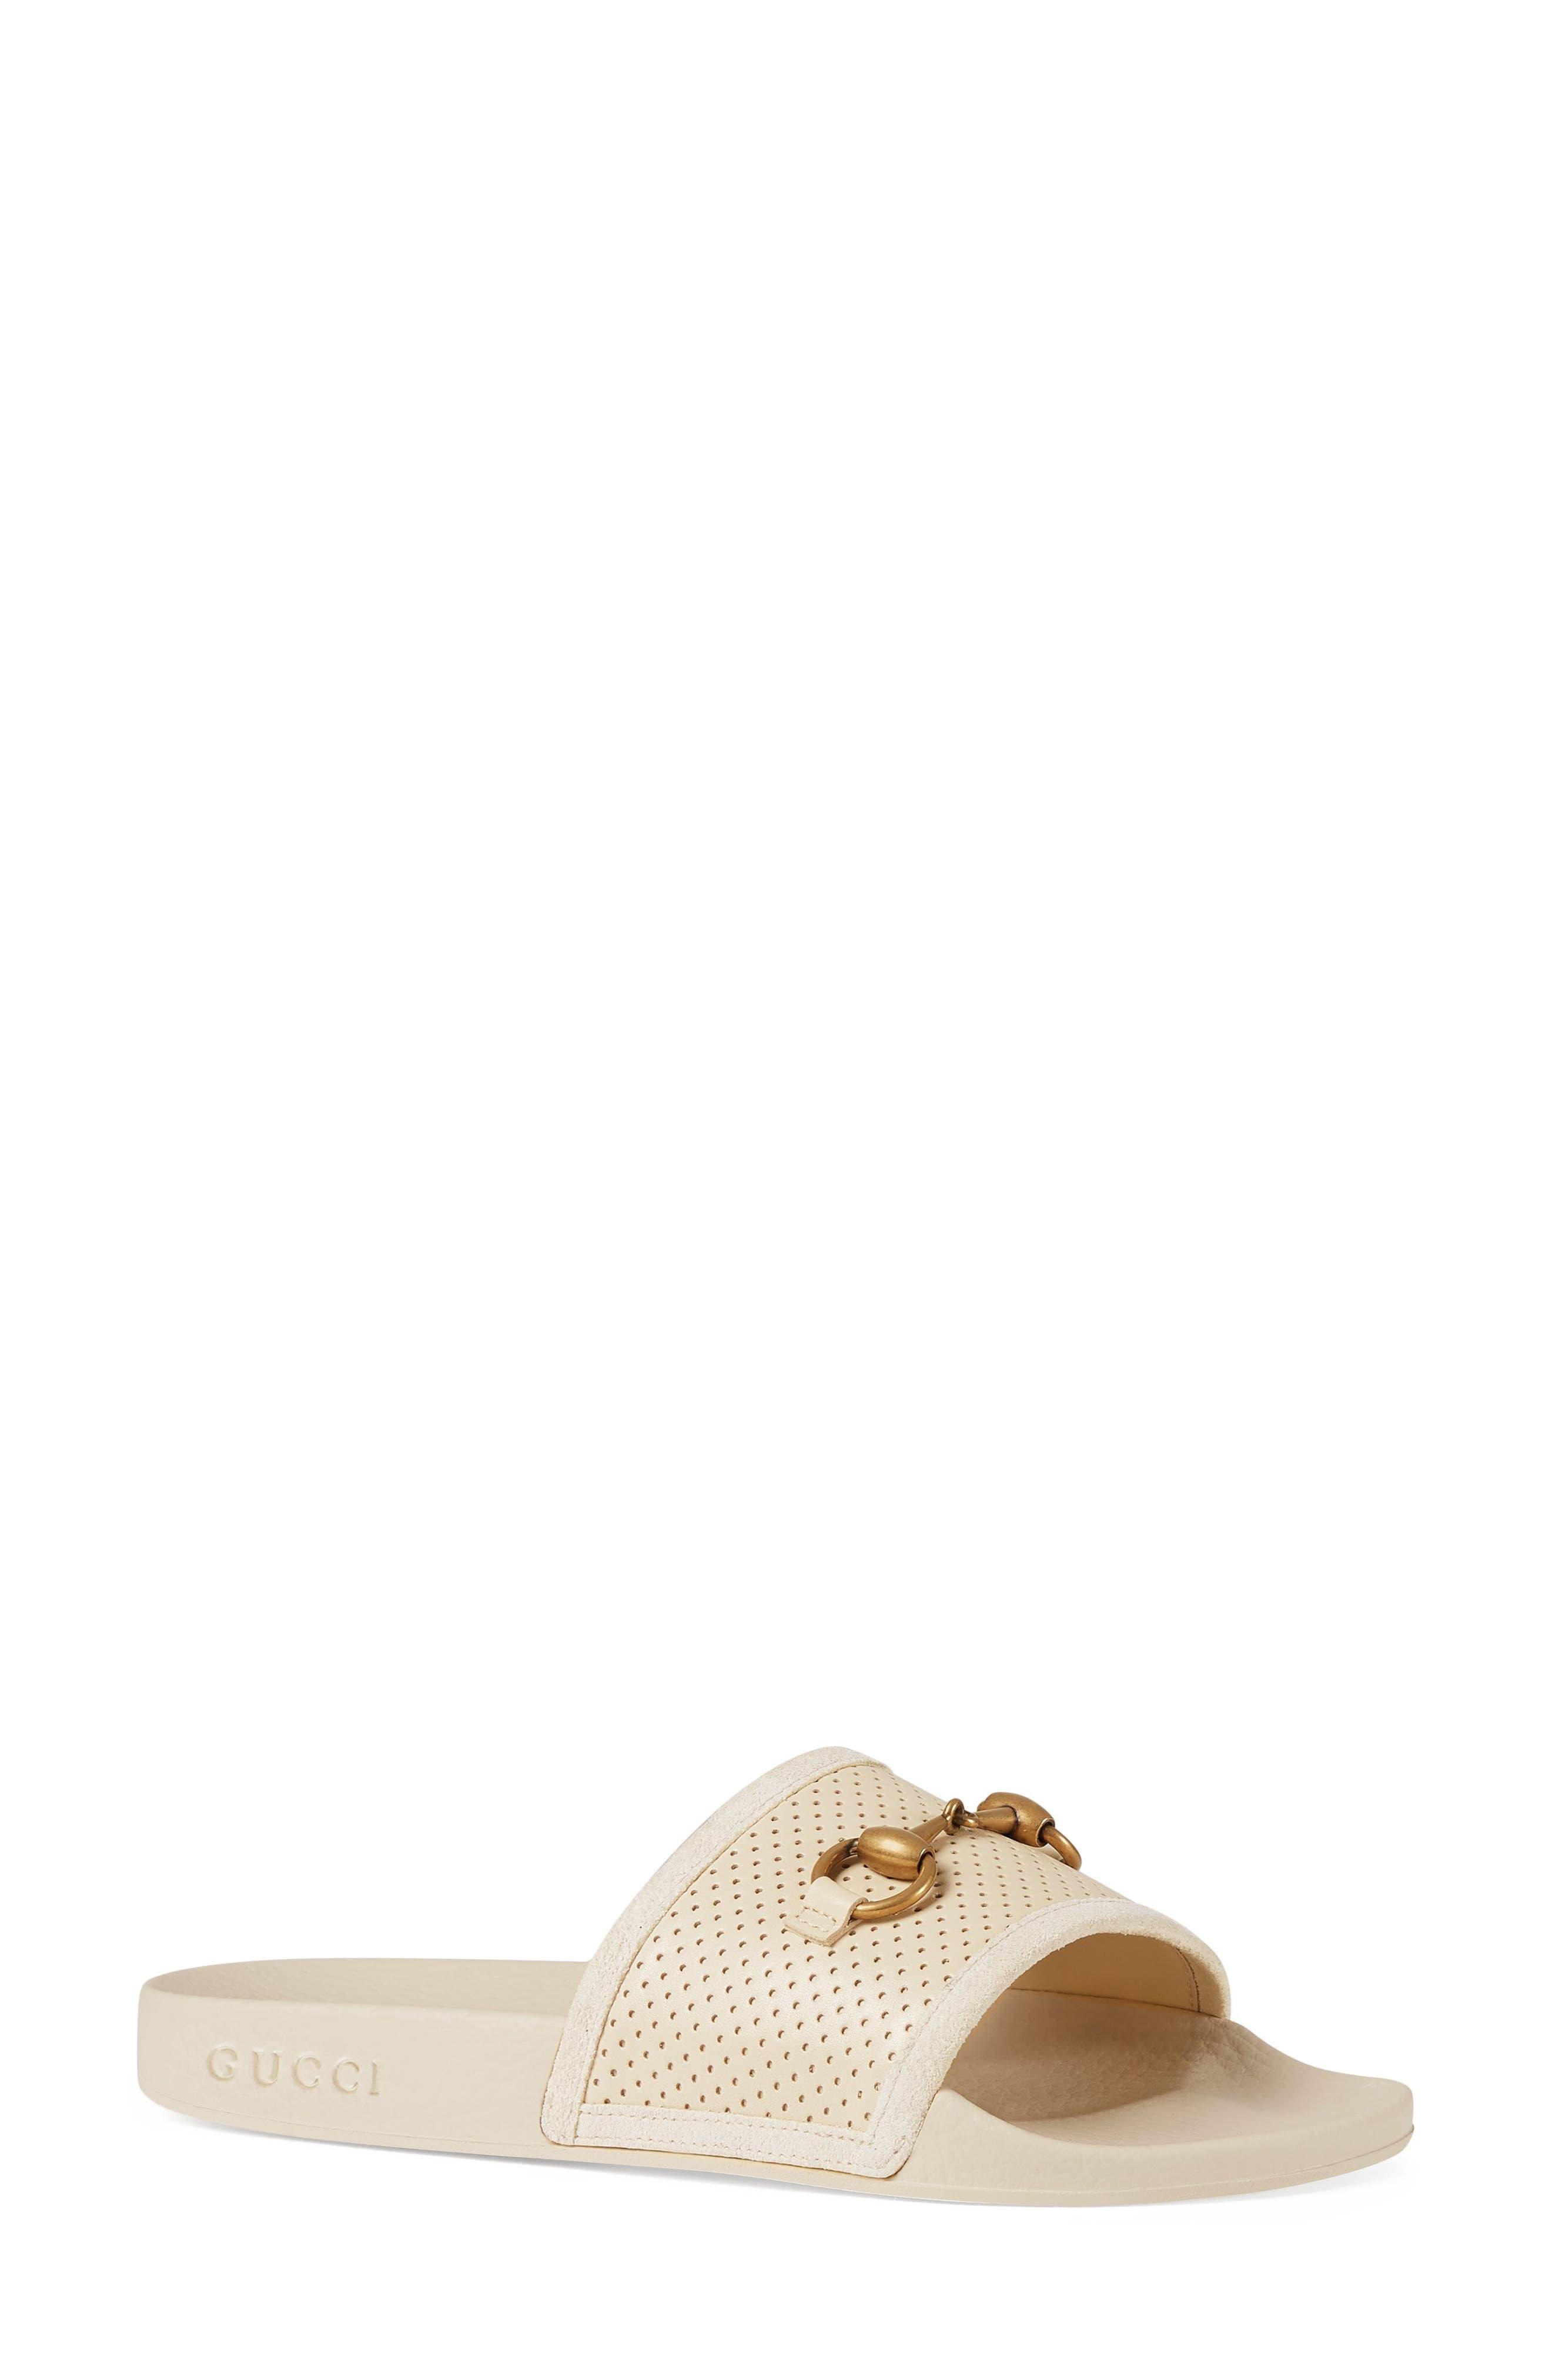 Alternate Image 1 Selected - Gucci Pursuit Horsebit Slide Sandal (Women)